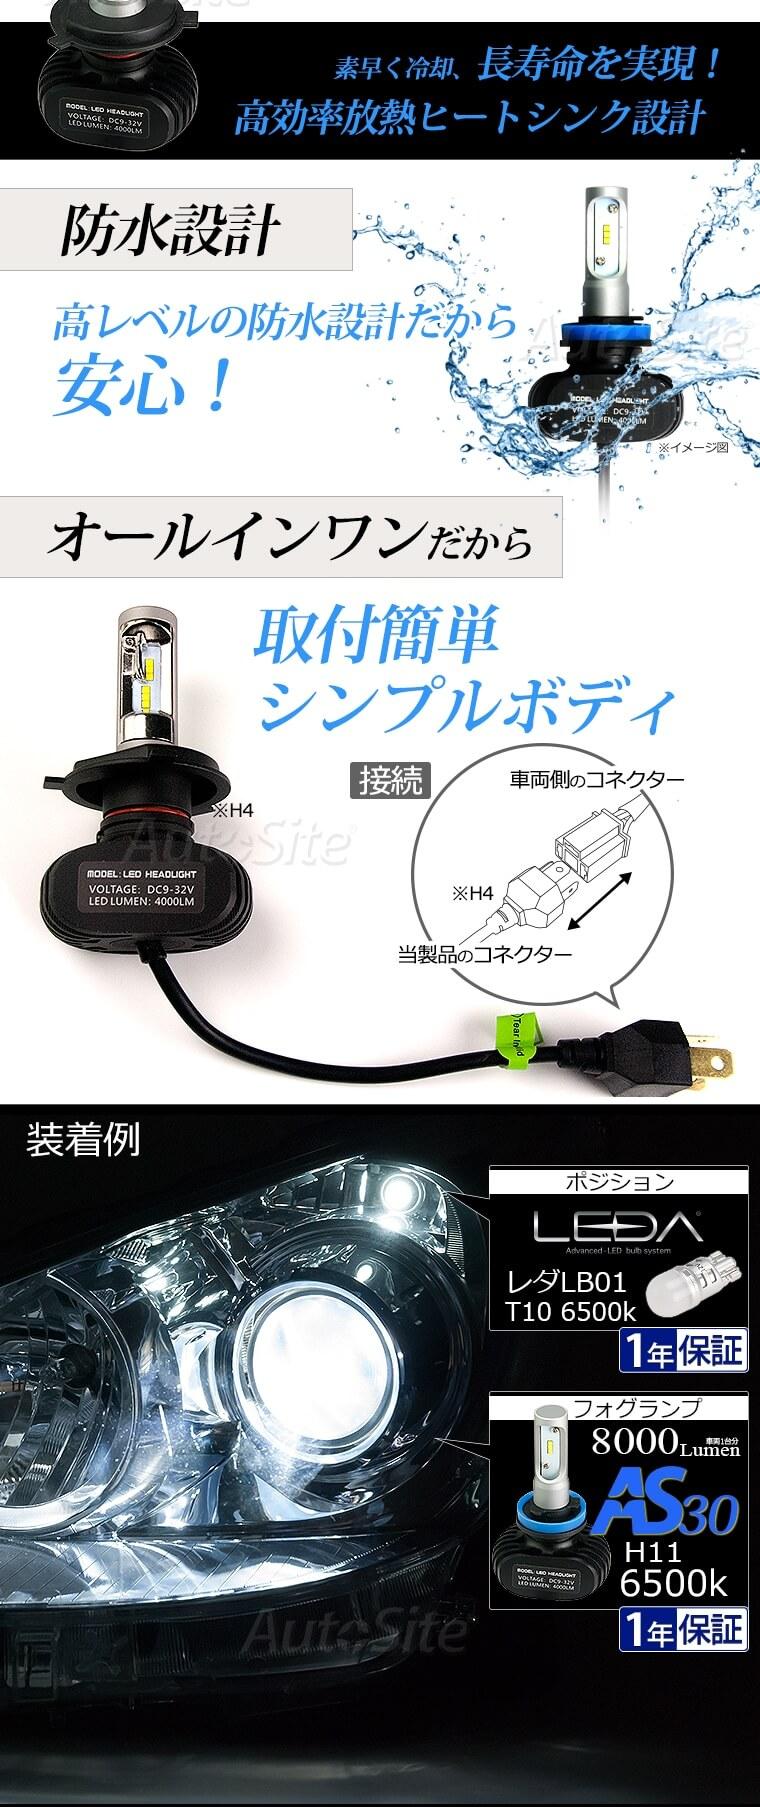 AutoSite LED ハイビーム フォグランプ